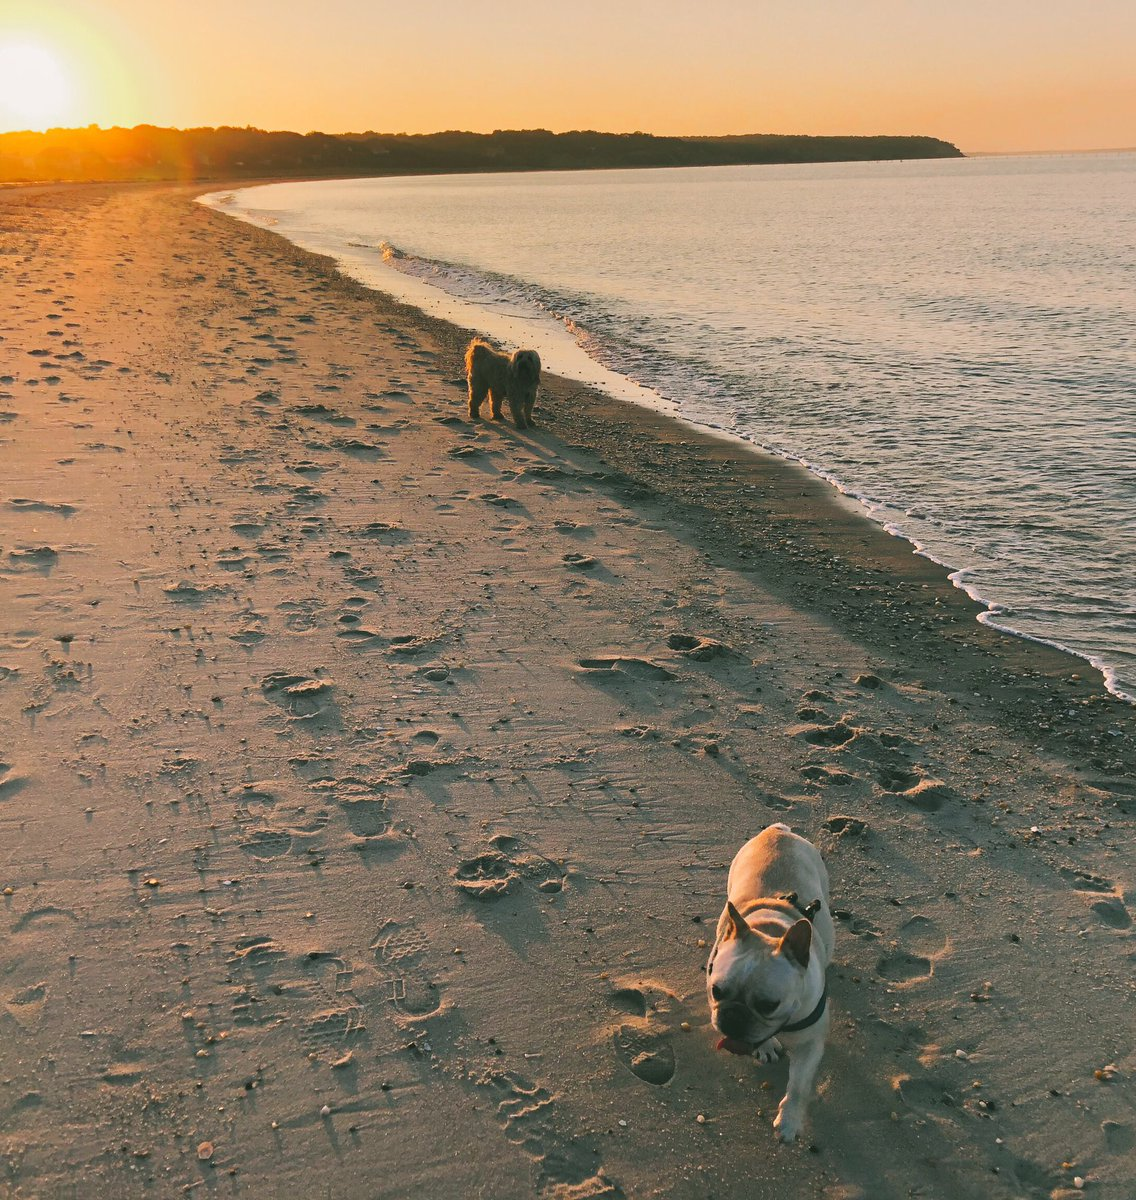 Sunset walk with Dali & Allegra https://t.co/Mb5eYBmdGA